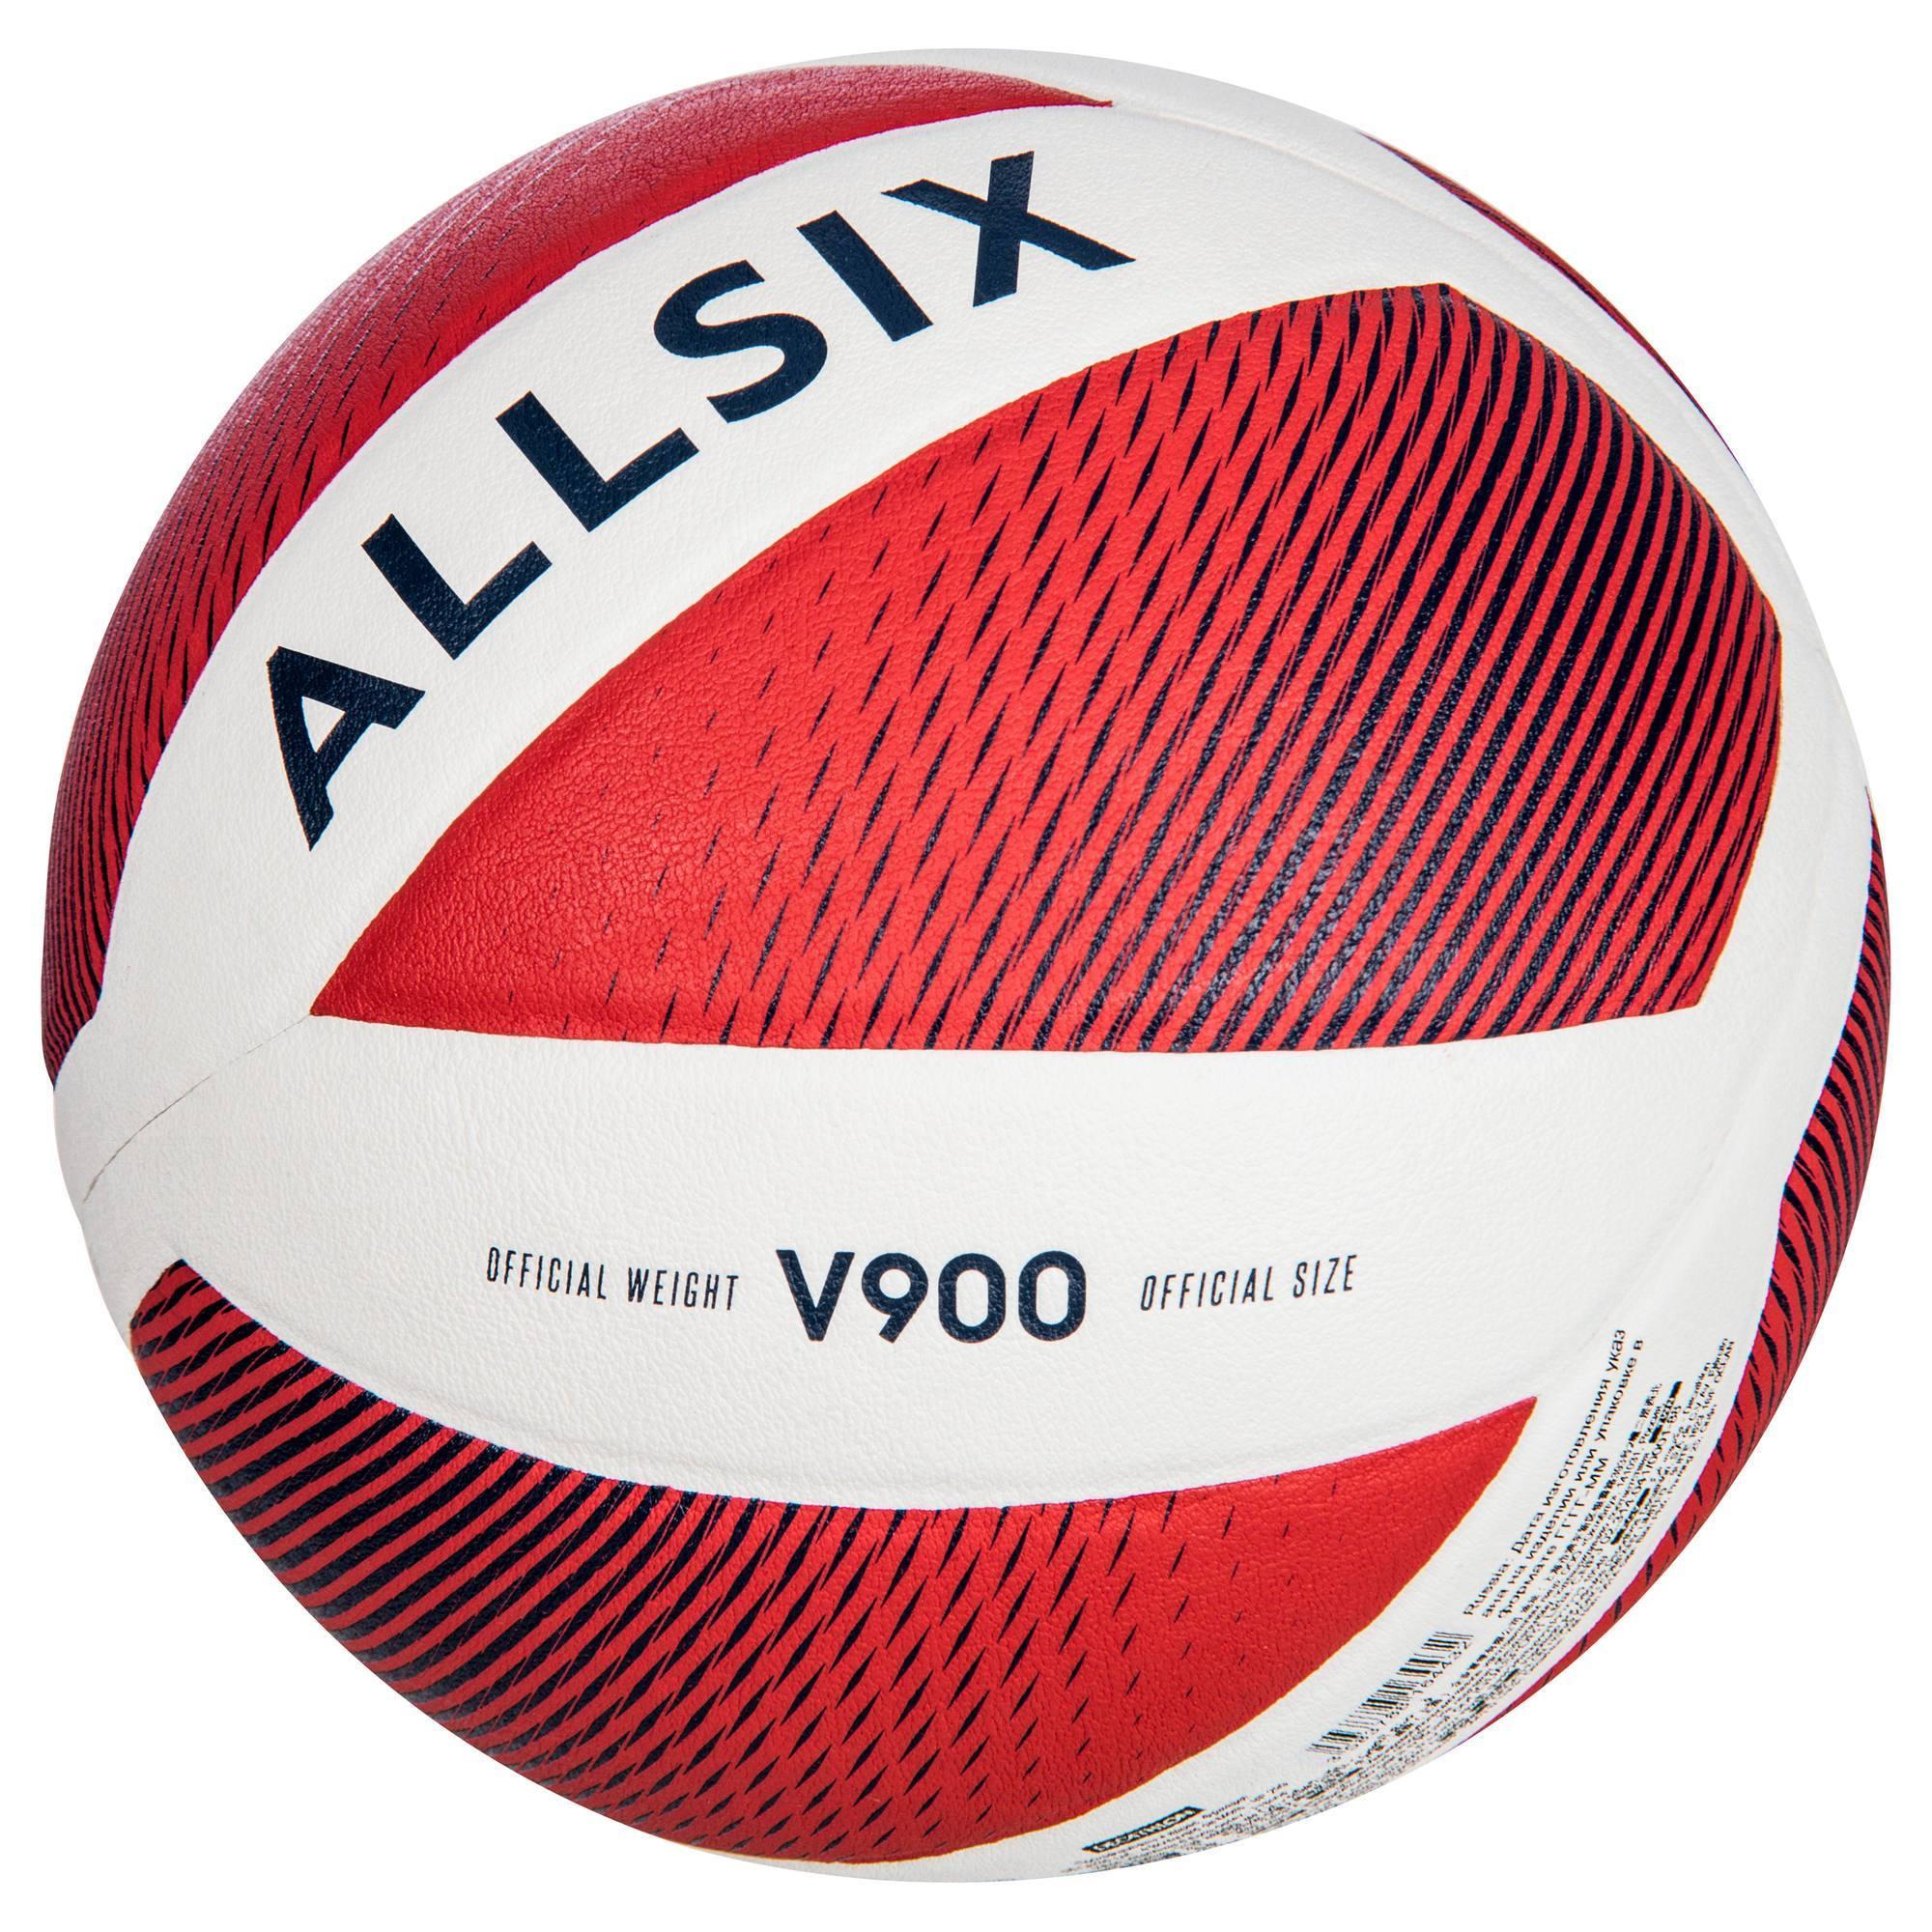 Ballon de volley-ball V900 FIVB blanc et rouge